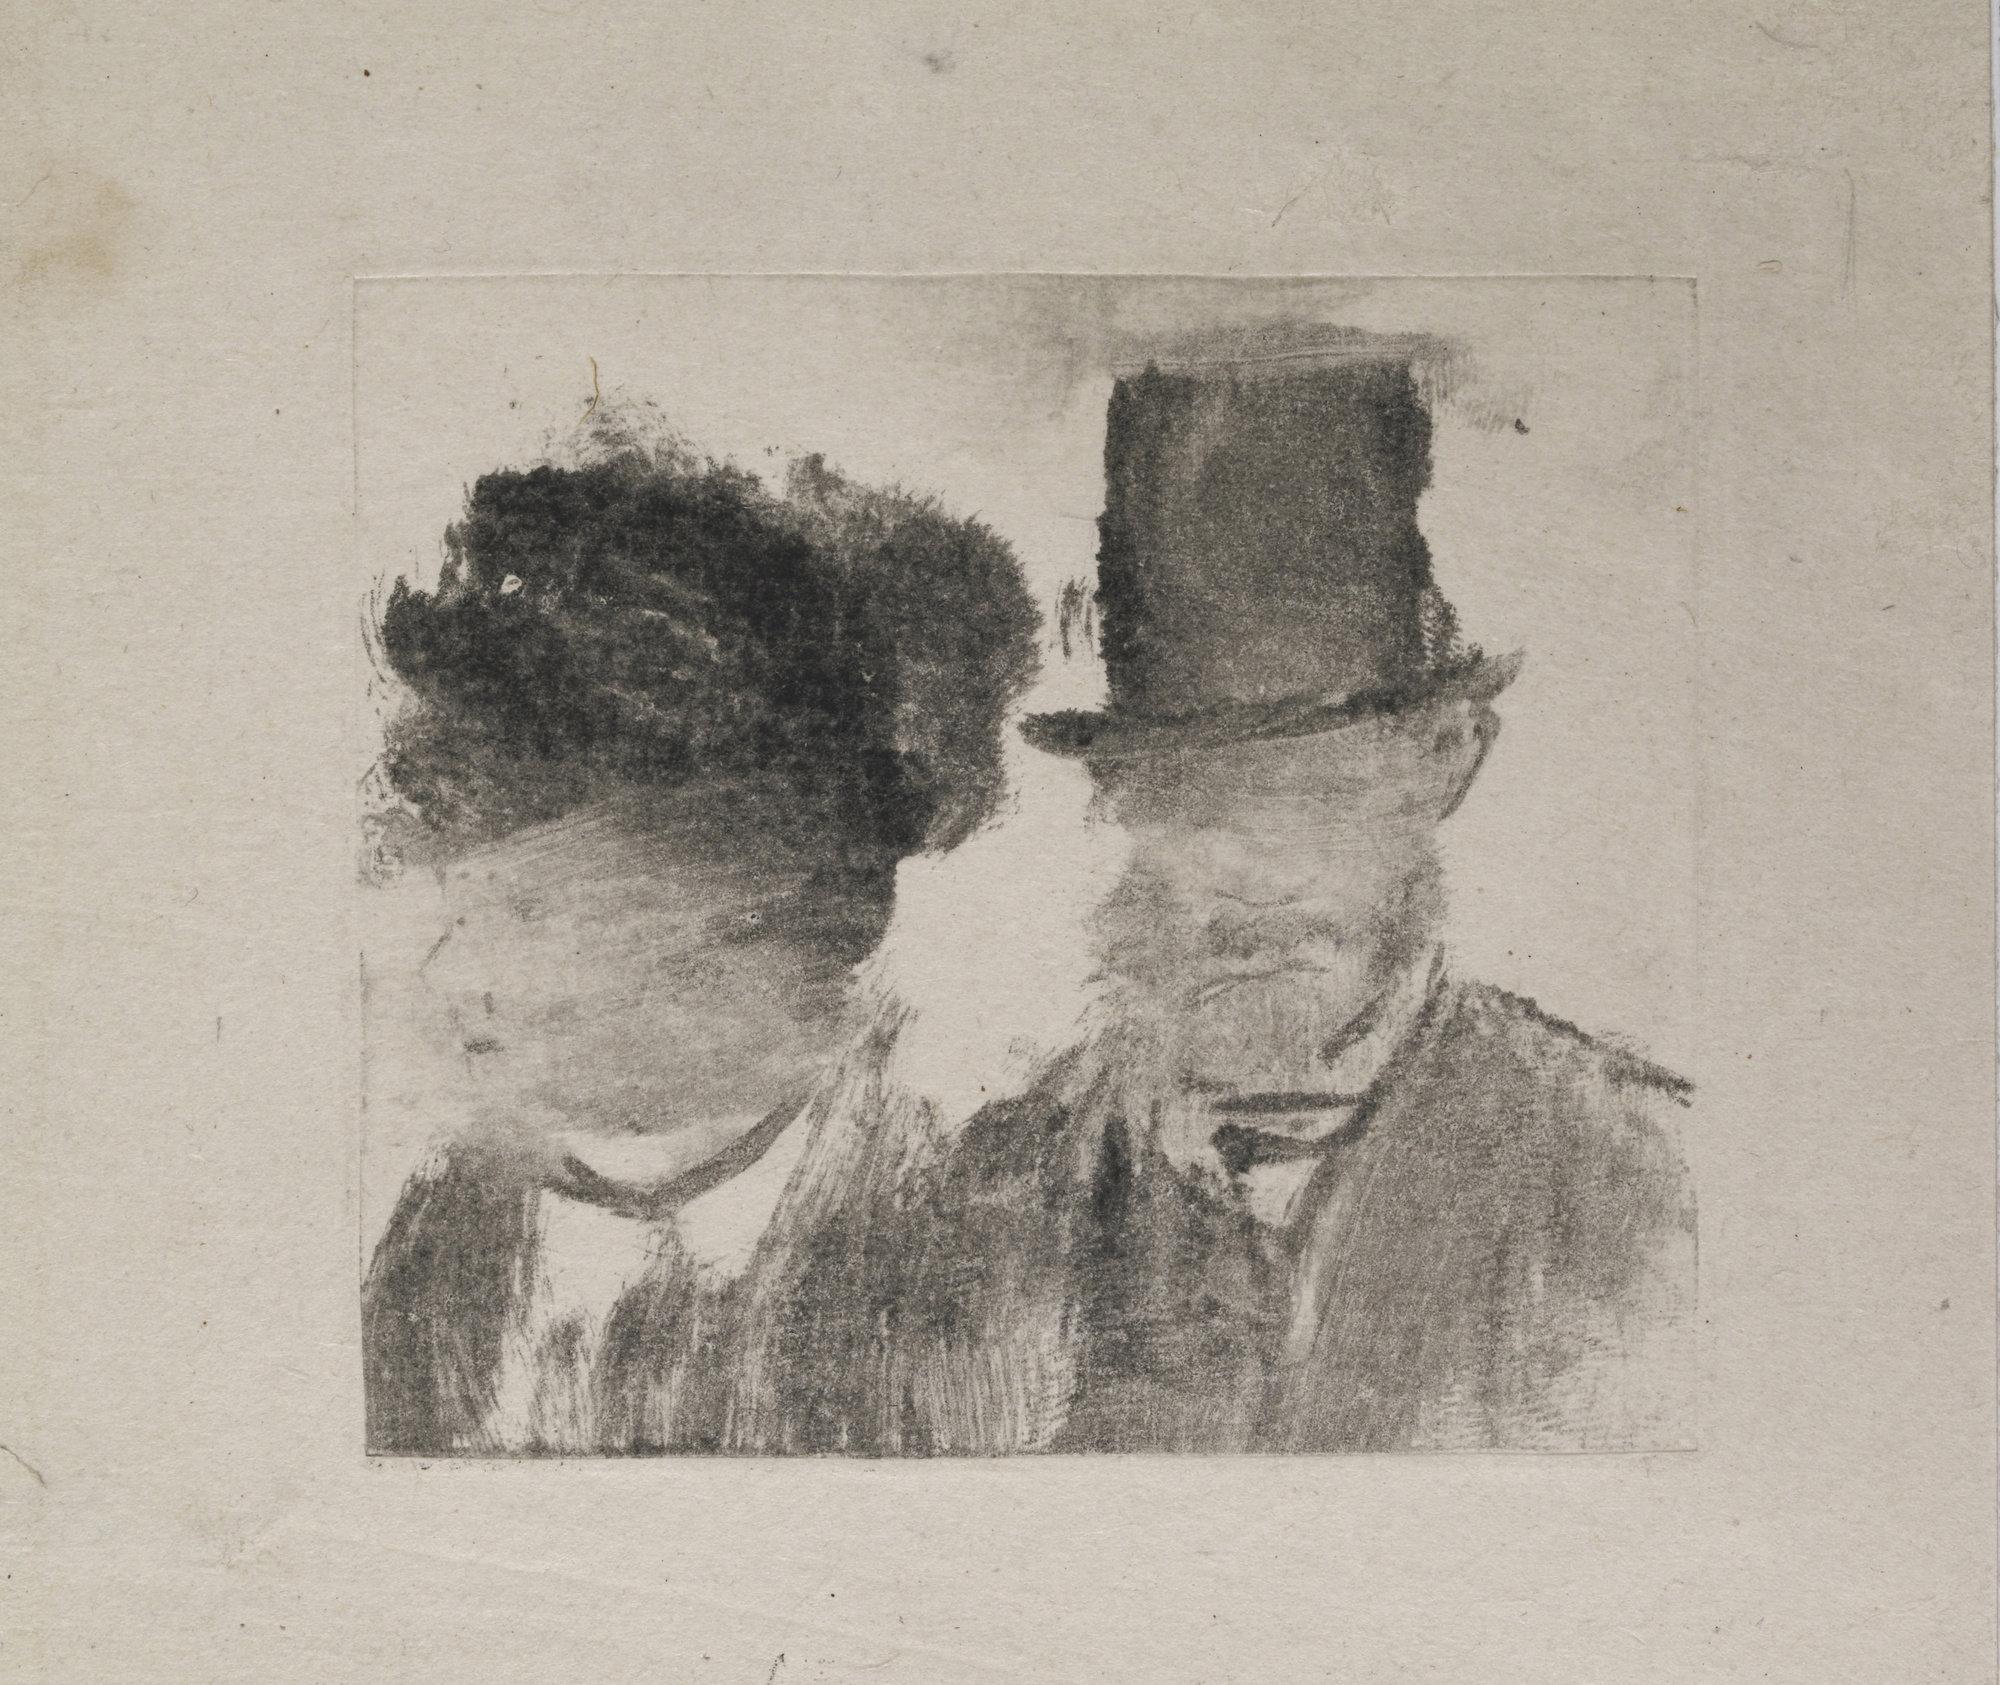 Jasper Johns And Edgar Degas Monotypes Monoprint Monotype